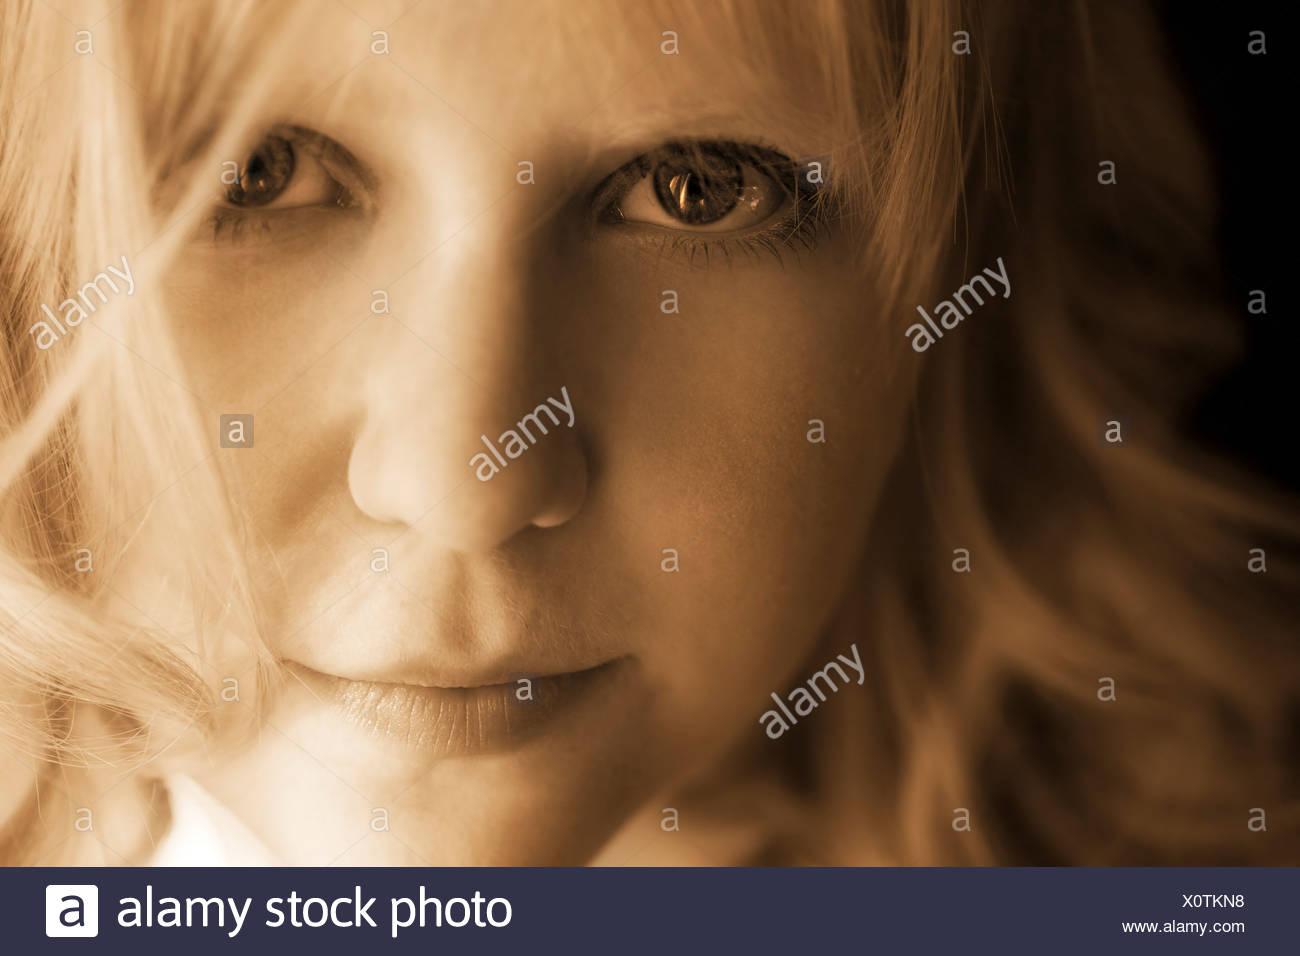 Female portrait - Stock Image